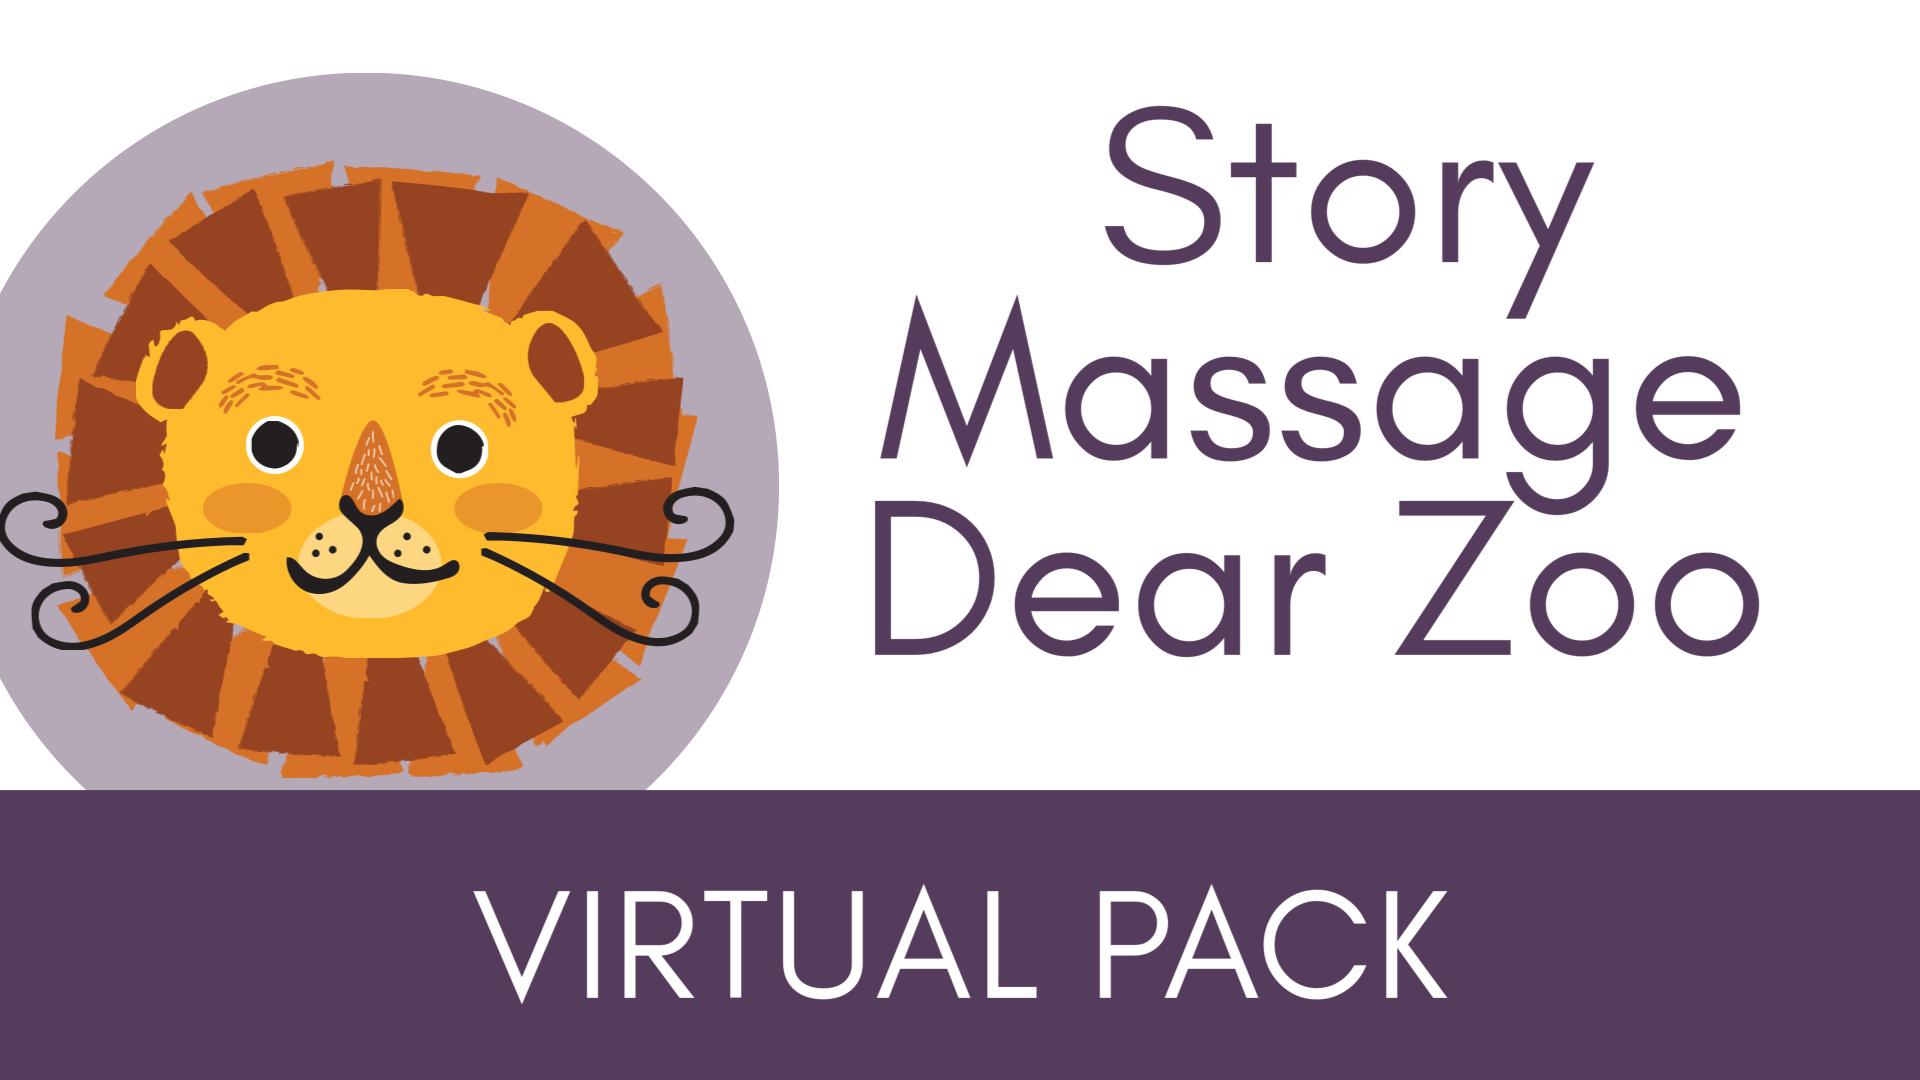 Story Massage Dear Zoo Virtual Packs